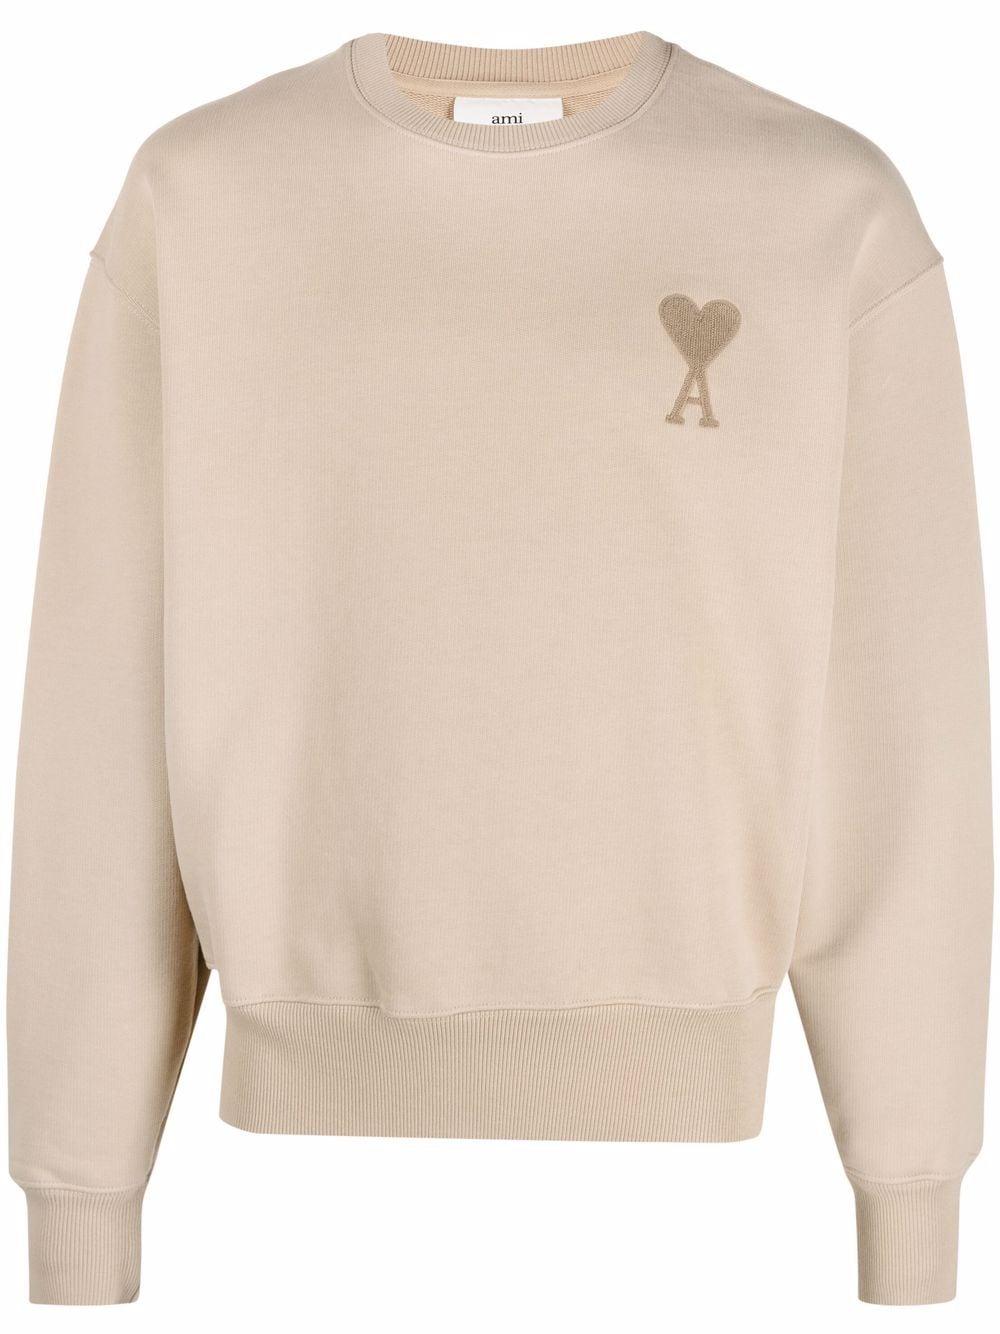 Ami de coeur sweatshirt Beige in Cotton Man AMI - ALEXANDRE MATTIUSSI   Sweatshirts   A21HJ028.747250